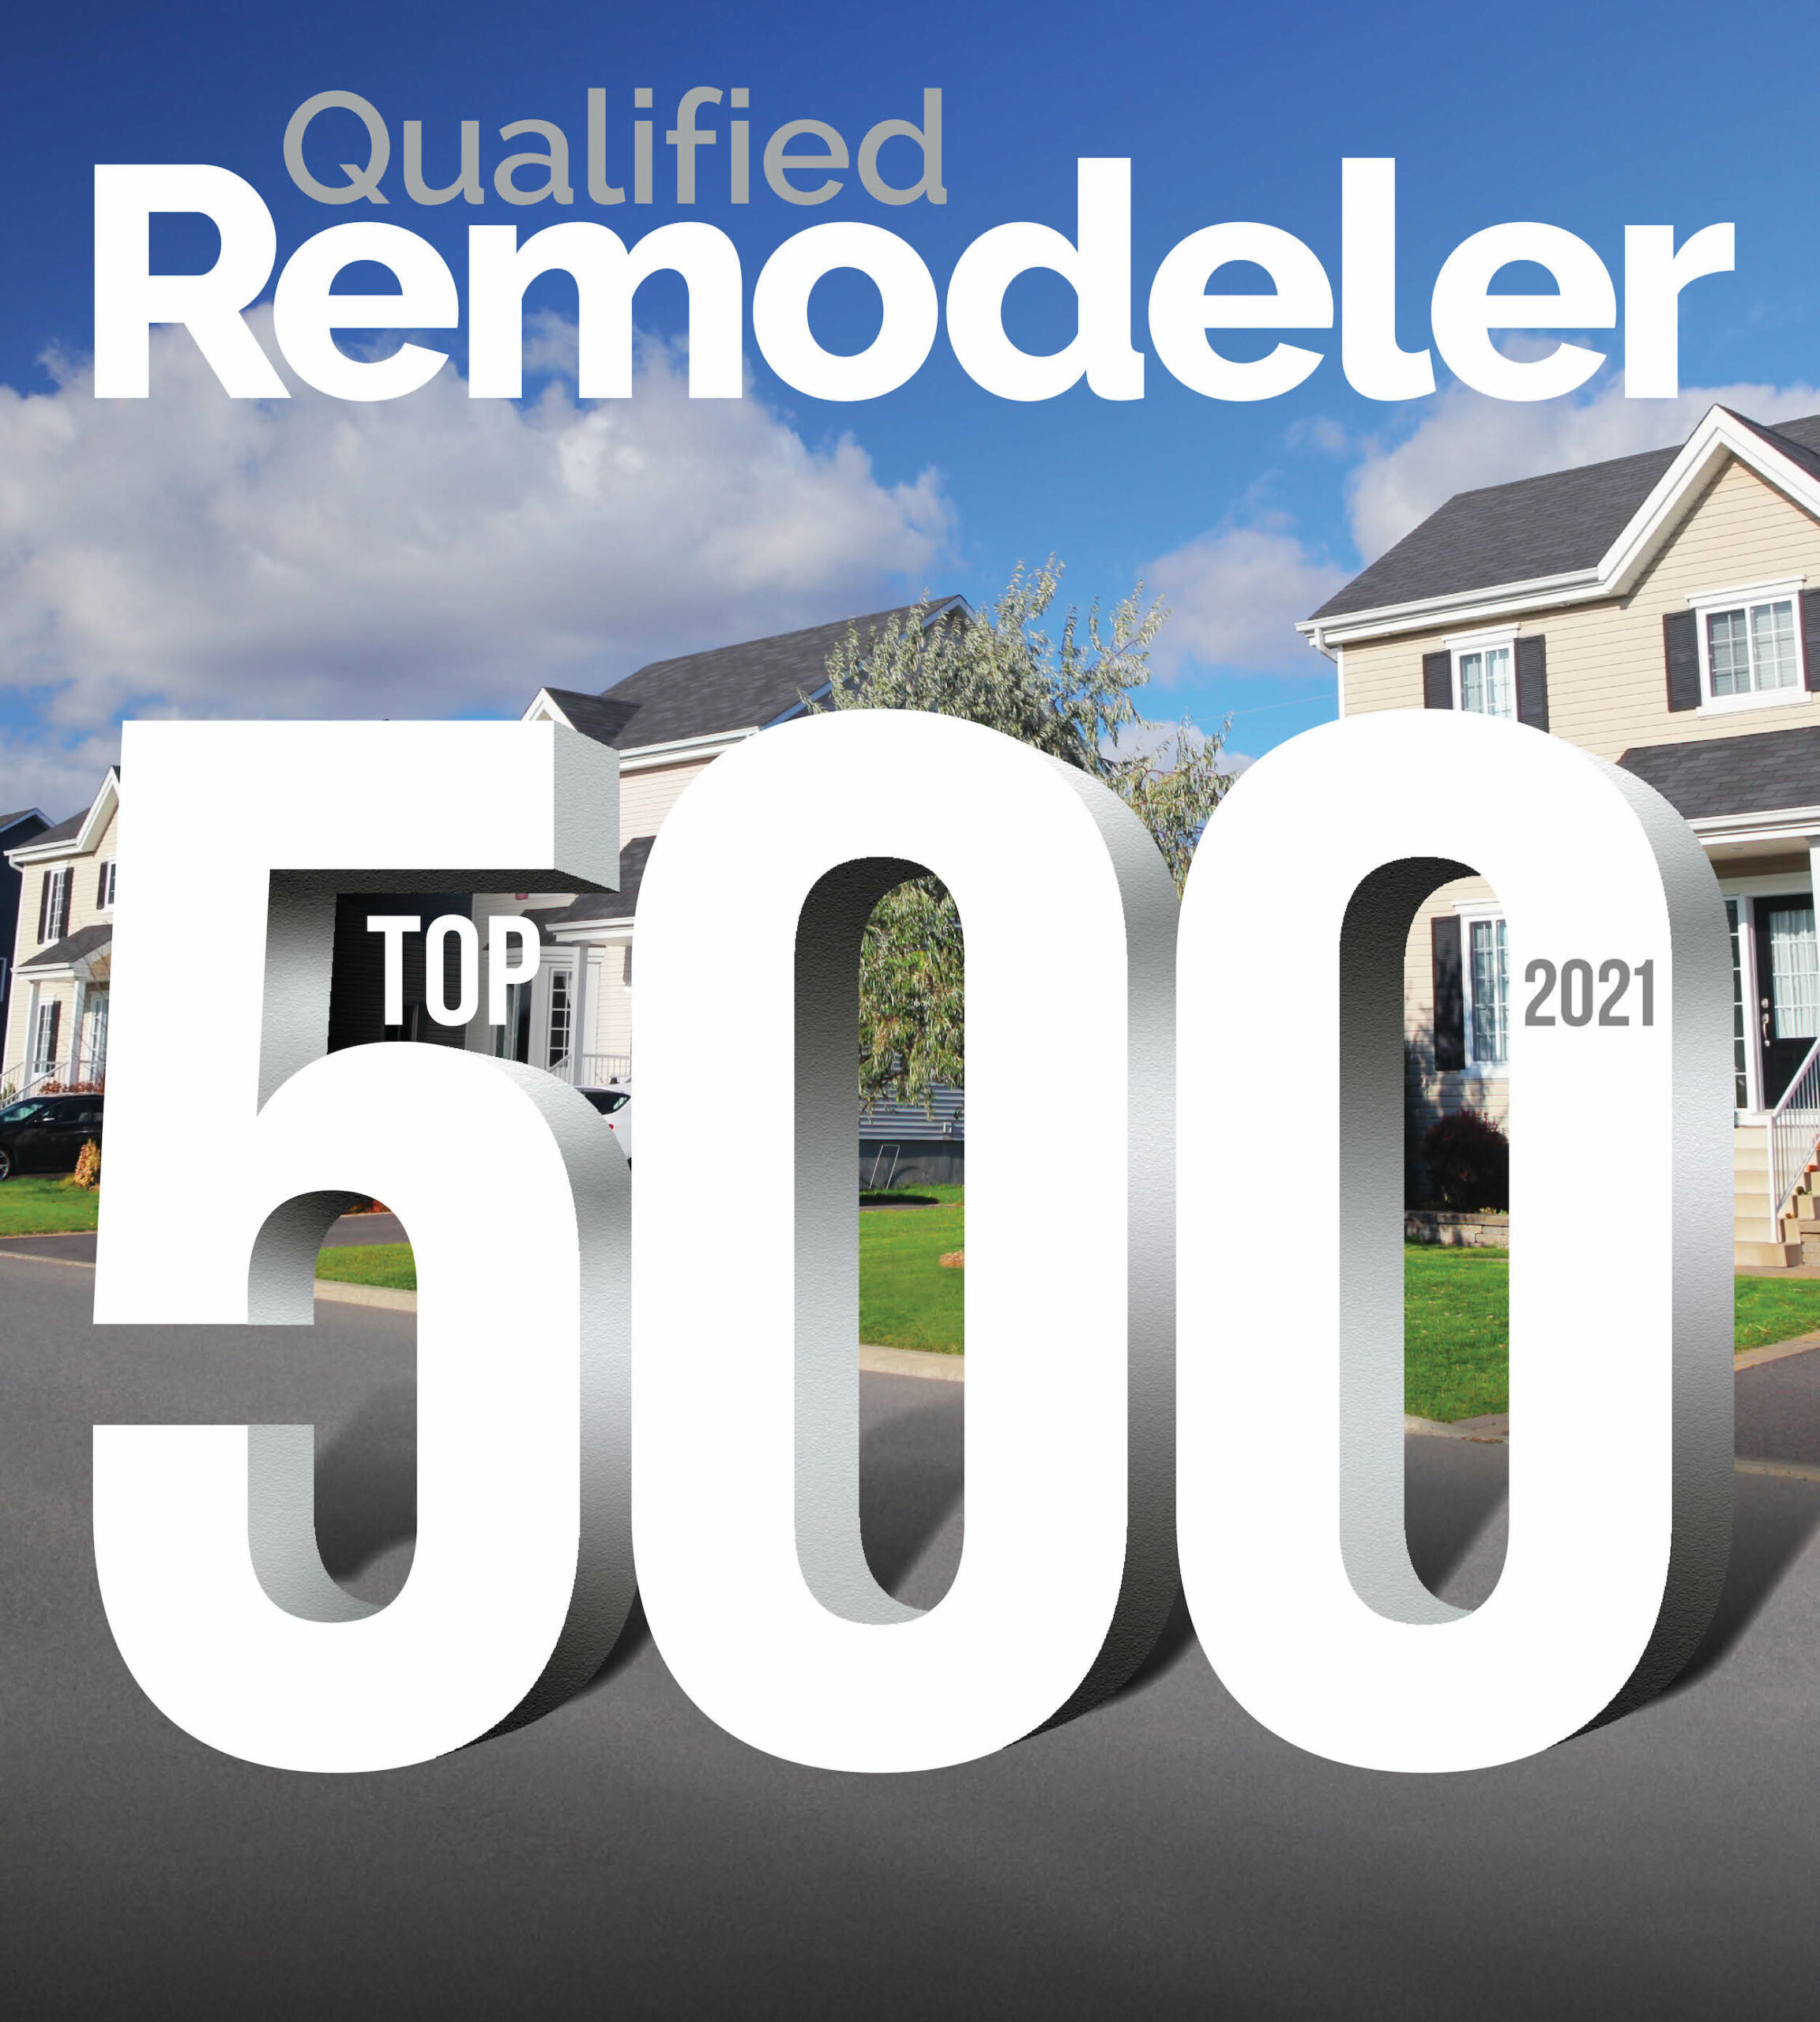 Bluestem Named to Qualified Remodeler TOP 500 List for 2021!